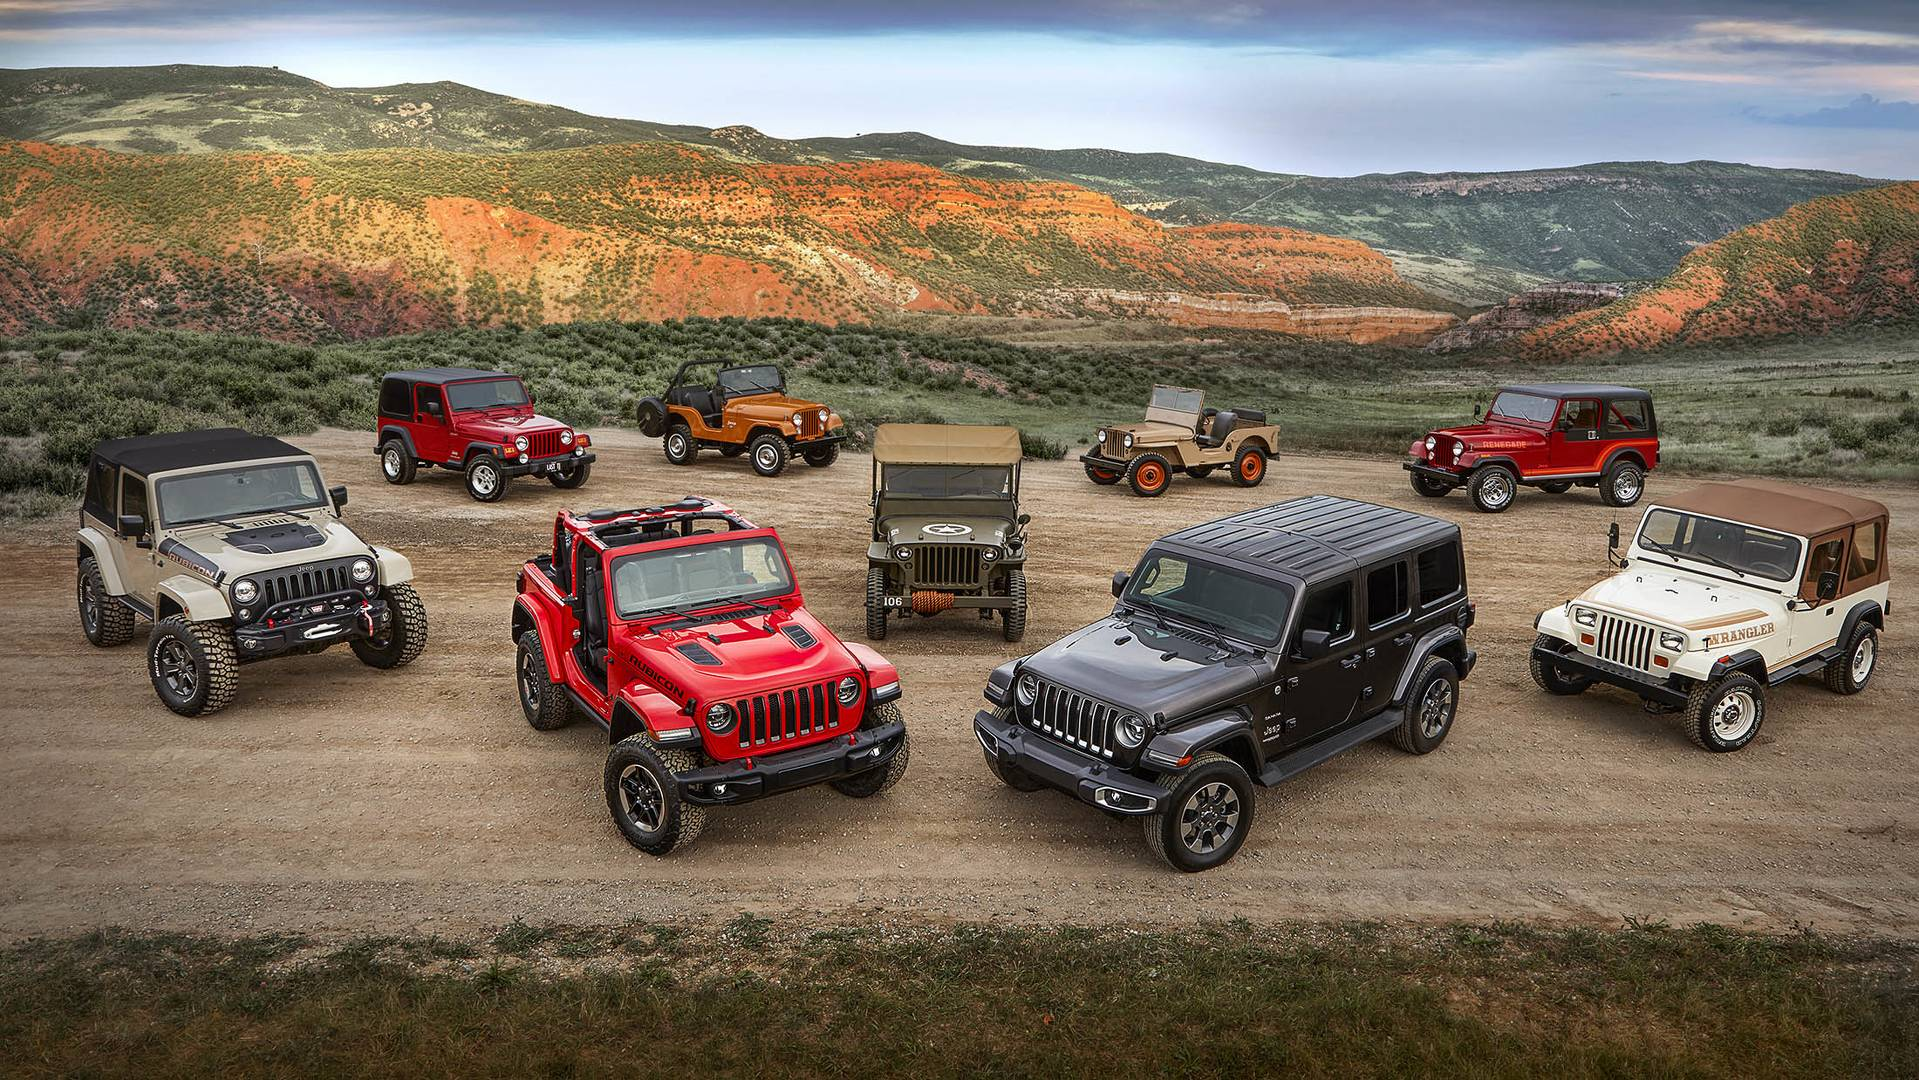 All-new 2018 Jeep® Wrangler Rubicon and Sahara with various historical Wrangler vehicles